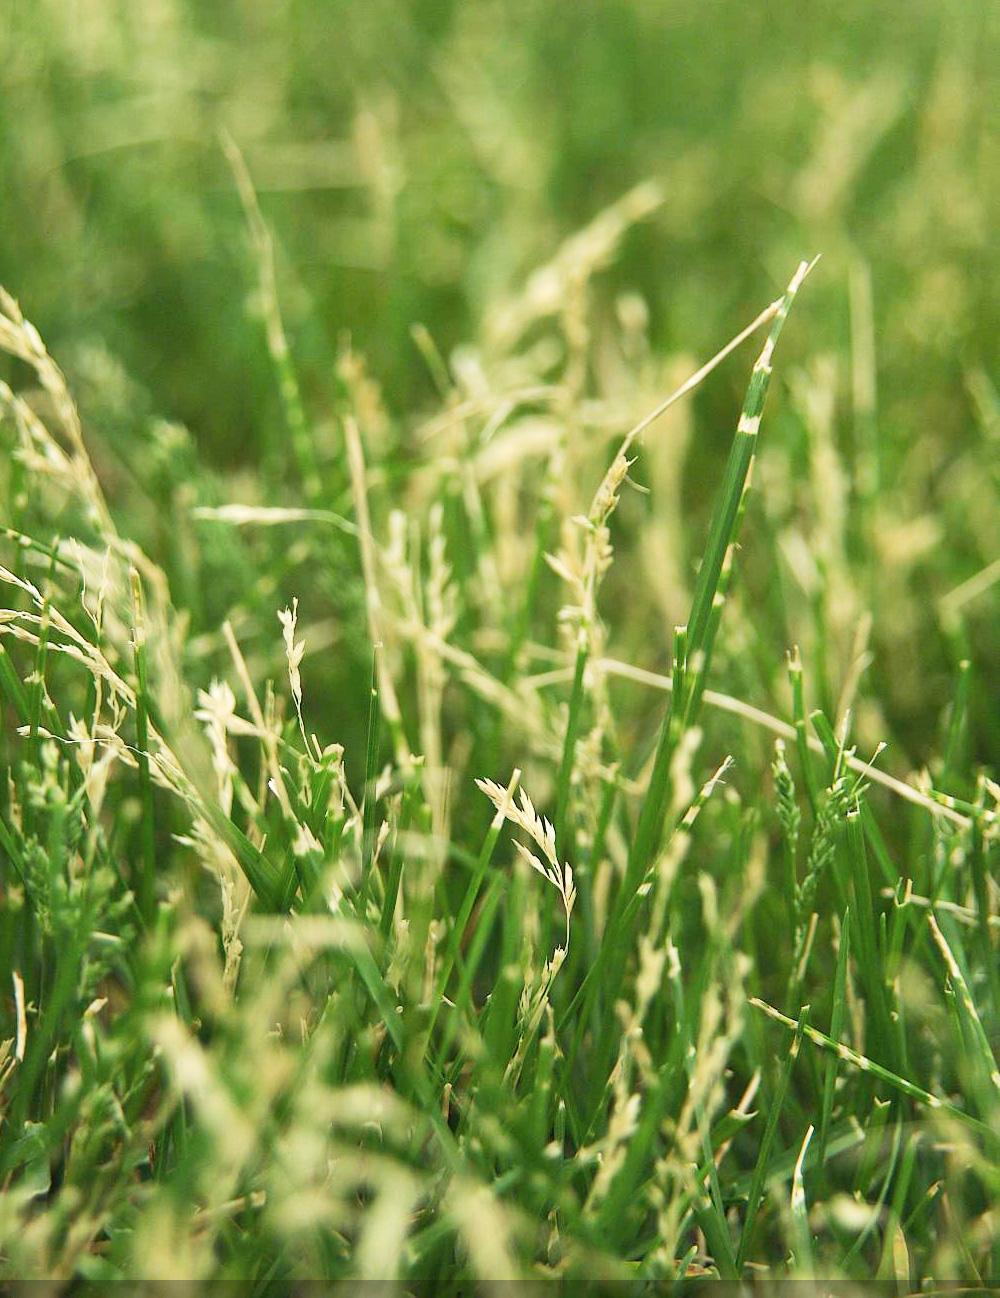 #8: Let grass go dormant